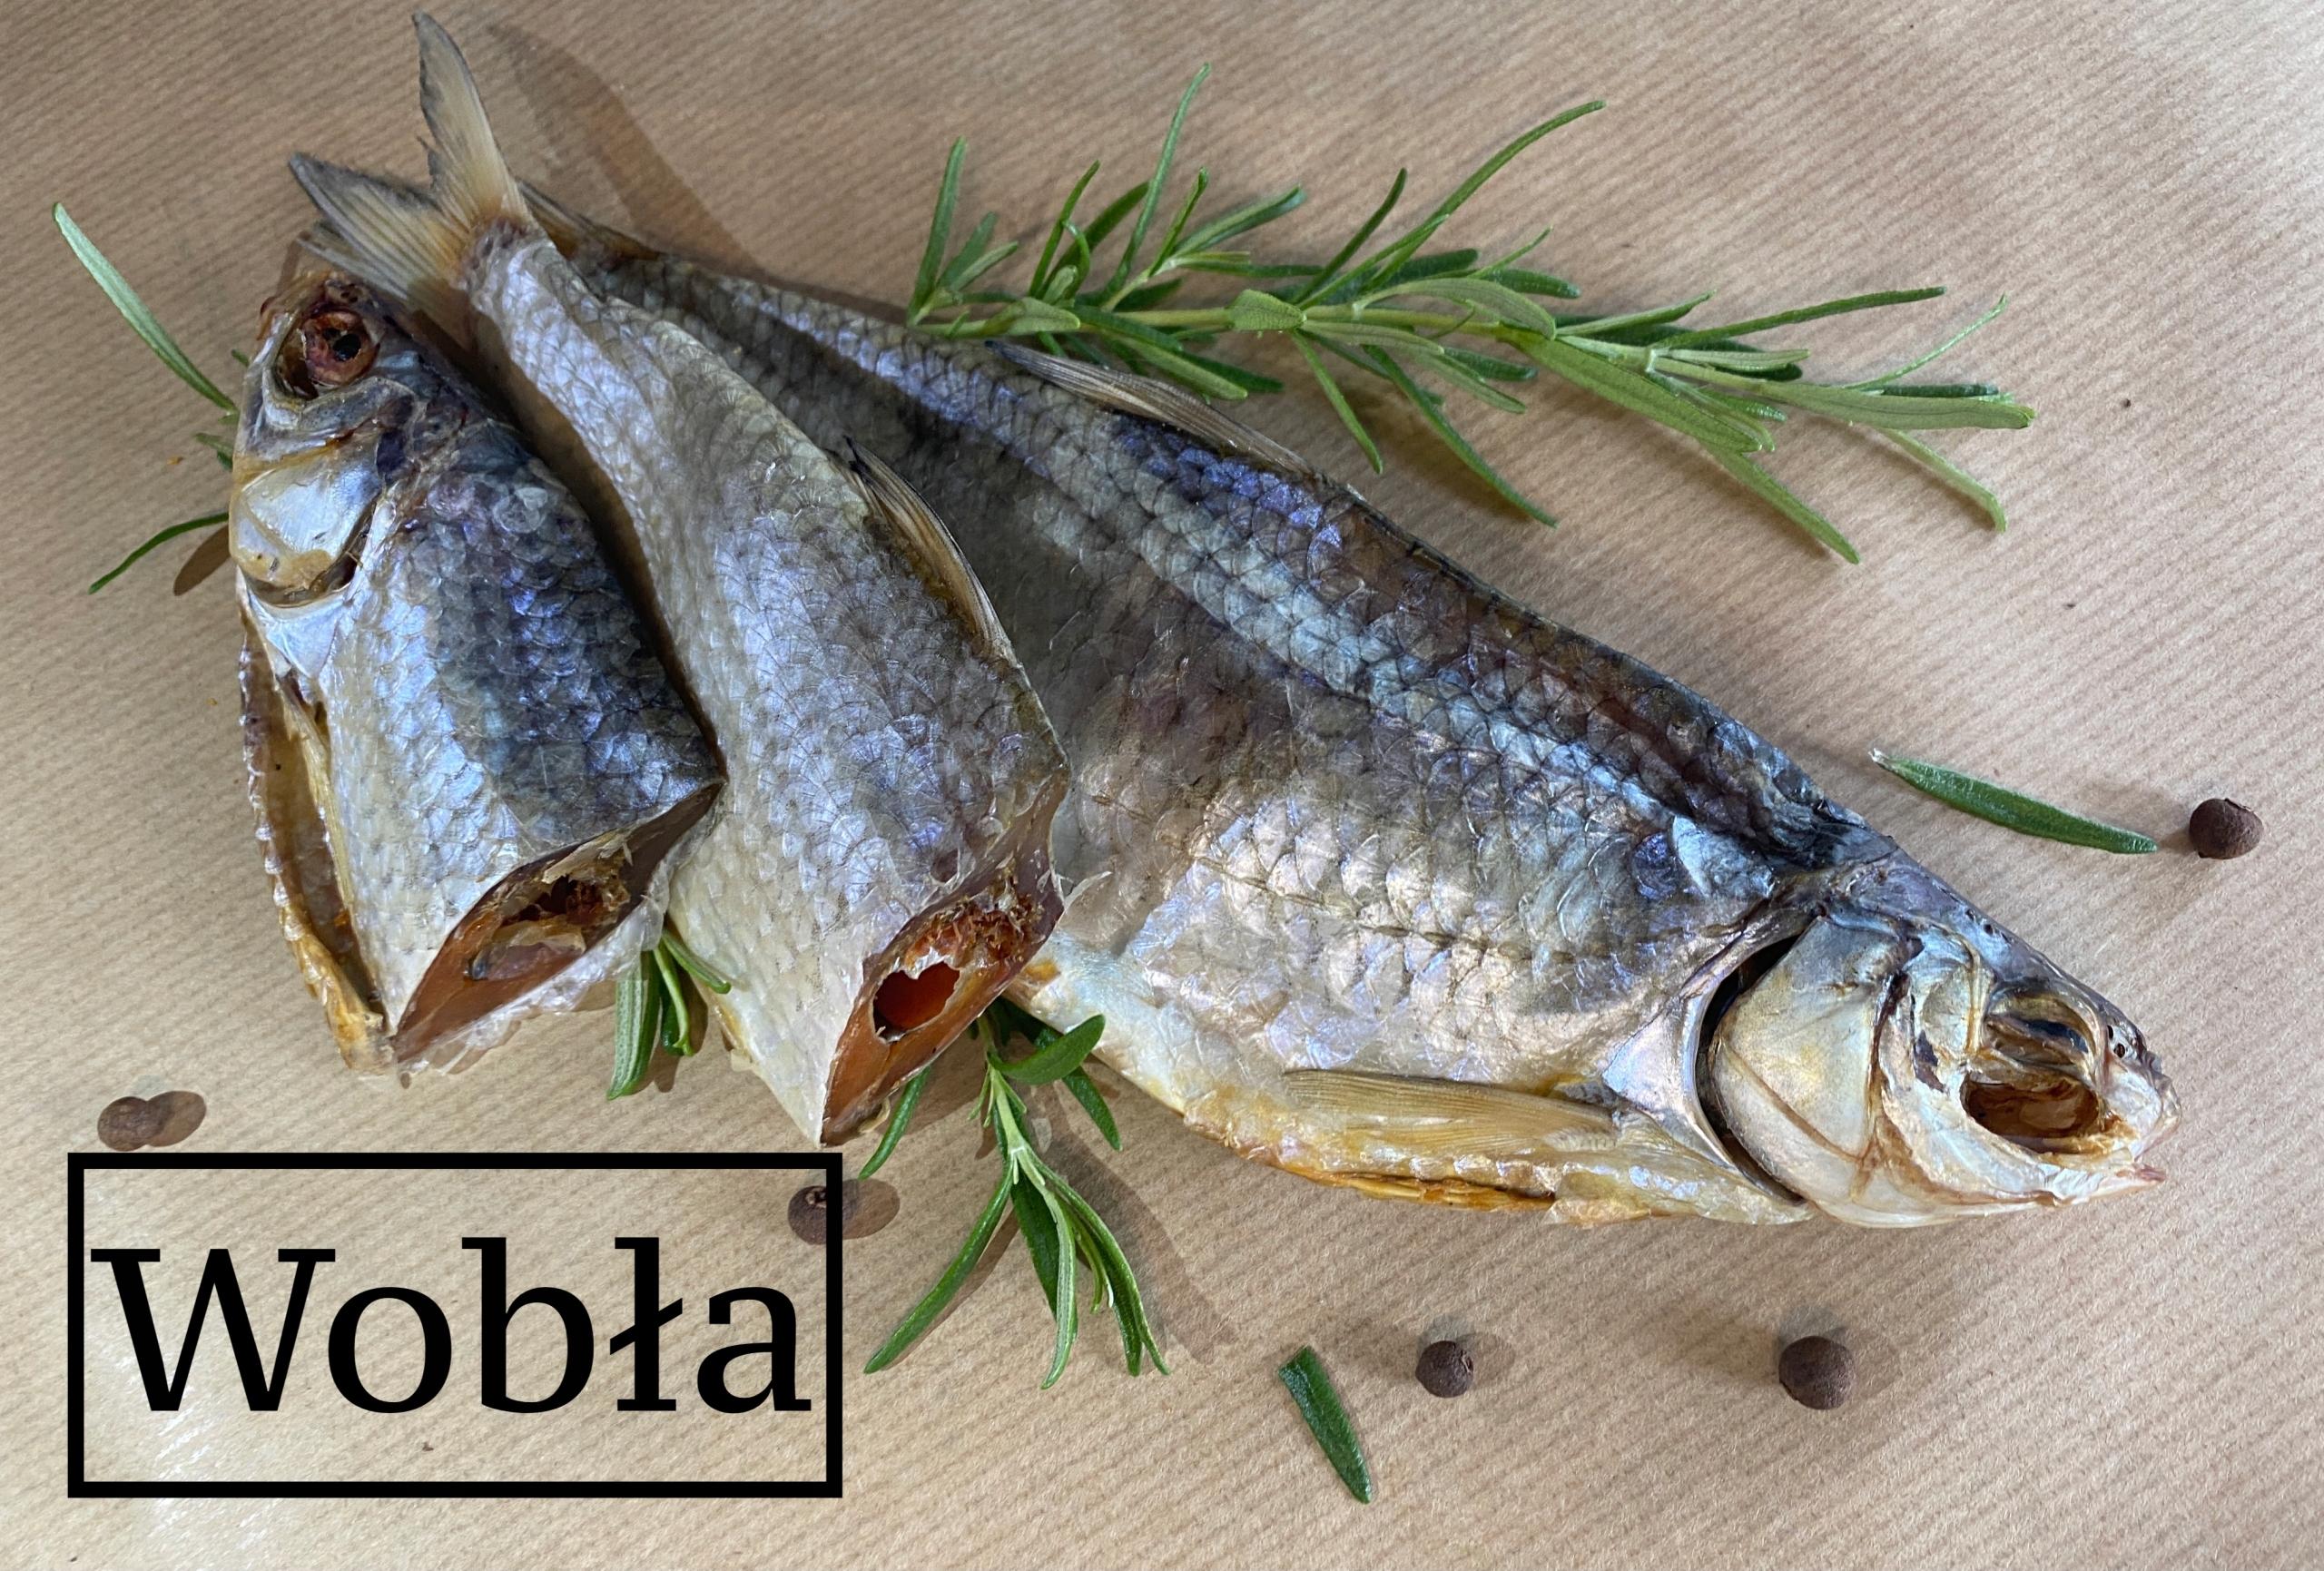 Вобла (каспийская плотва) Сушеная рыба 200 +/- 10г